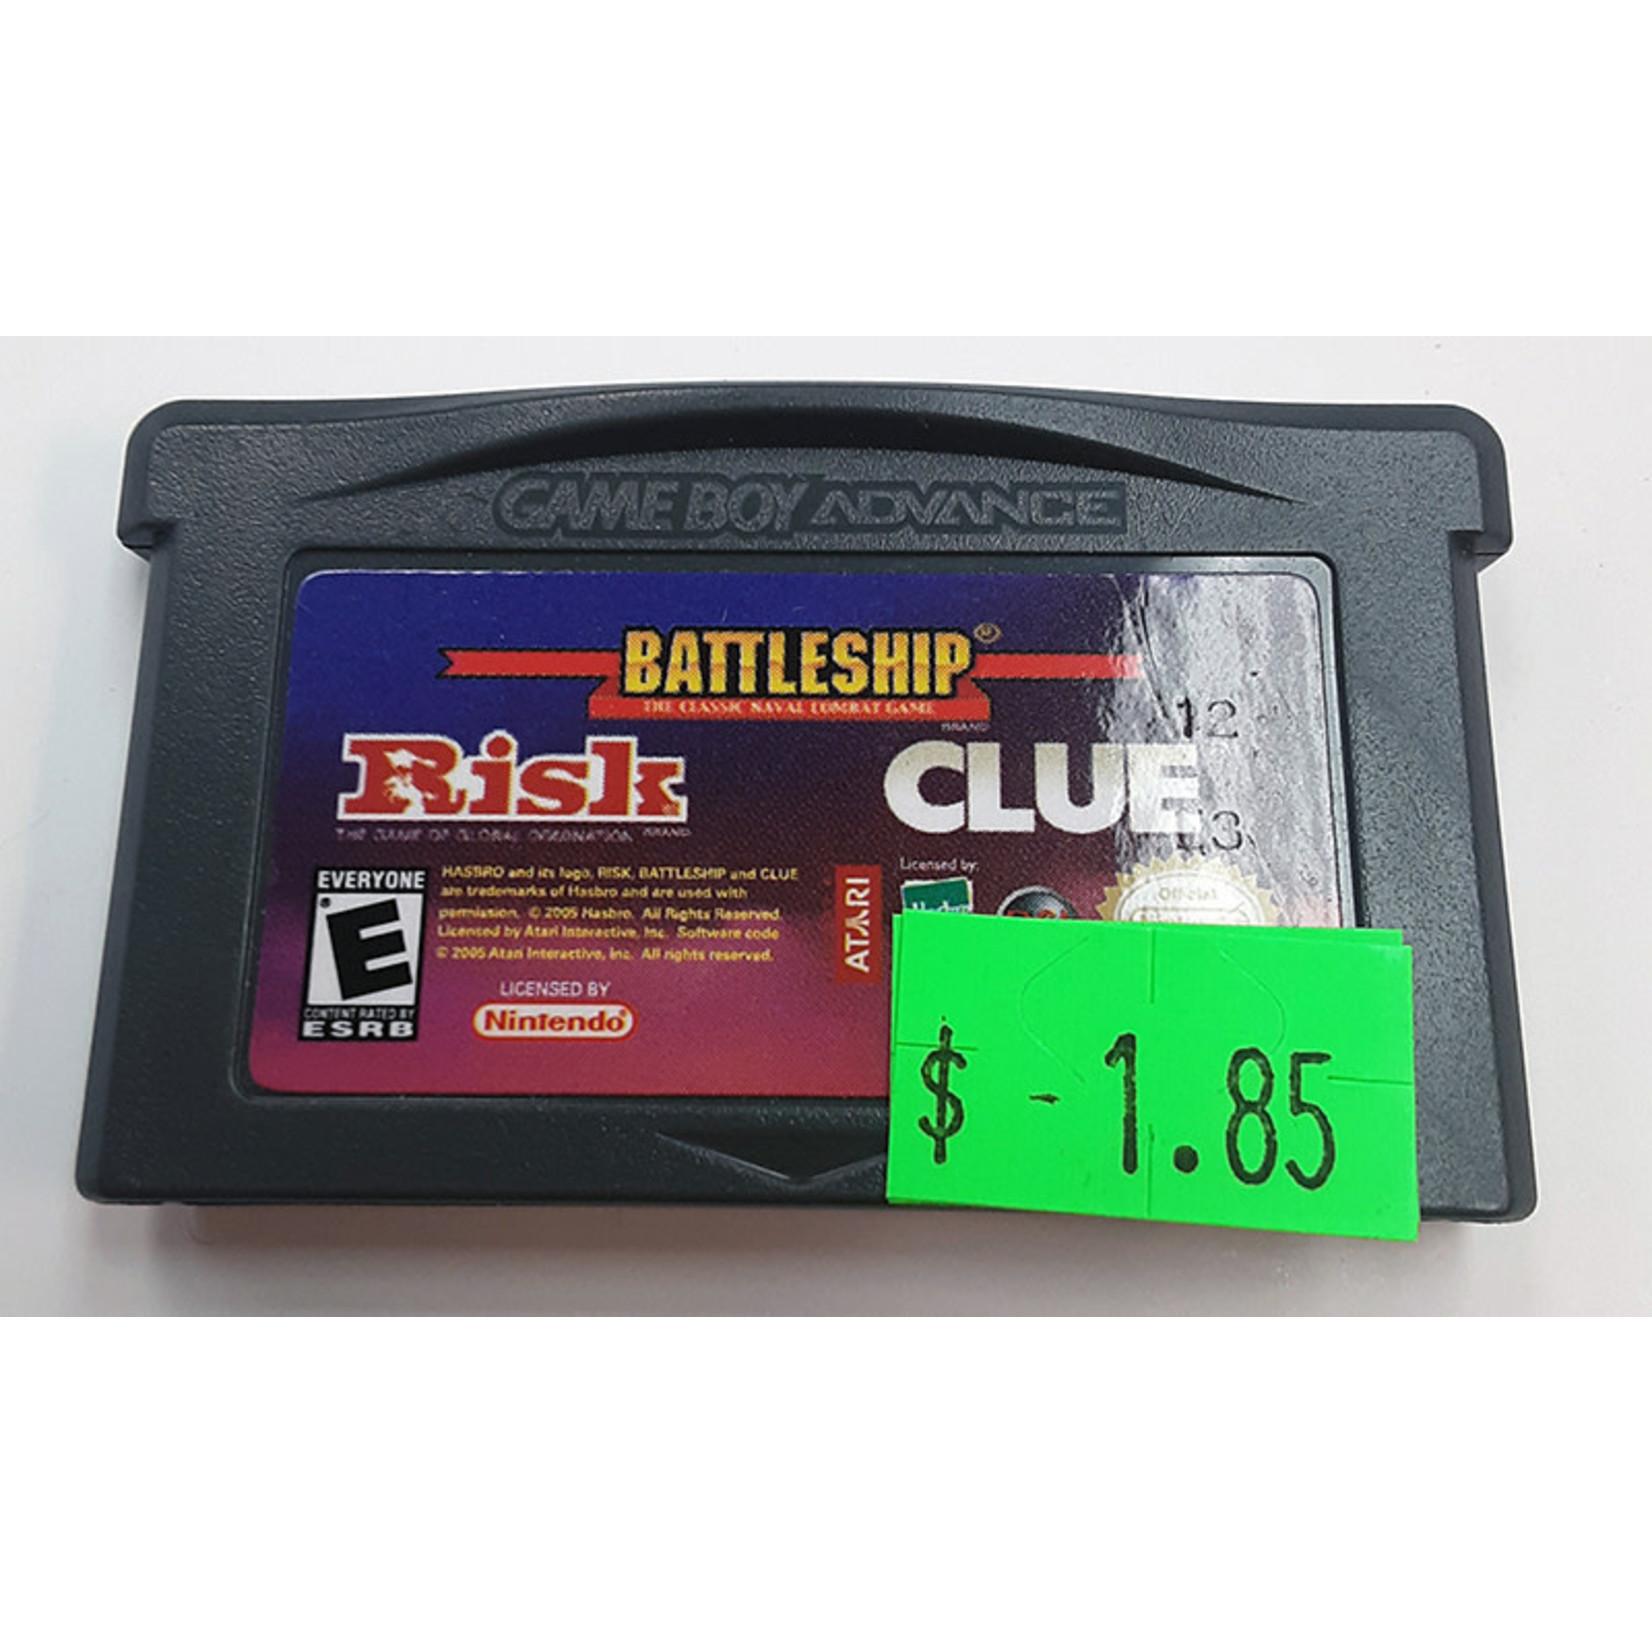 GBAu-Battleship / Risk / Clue (cartridge)